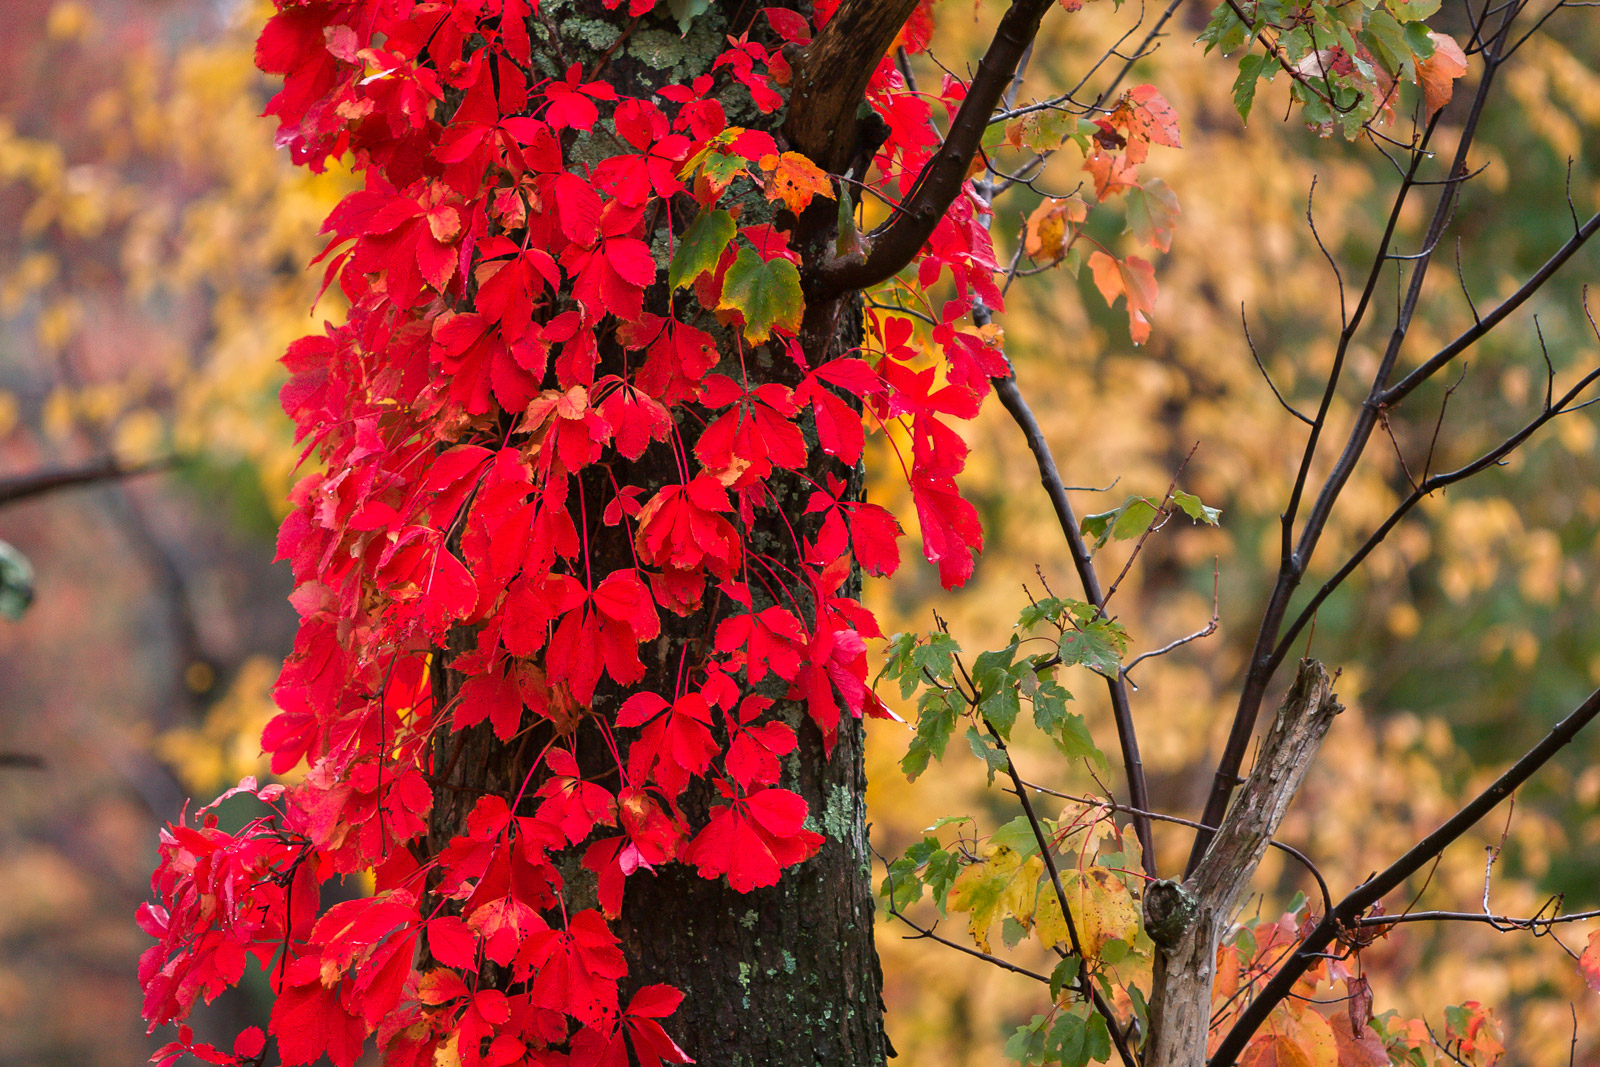 Virginia, Shenandoah, Fall, Color, Red, fall color, photo